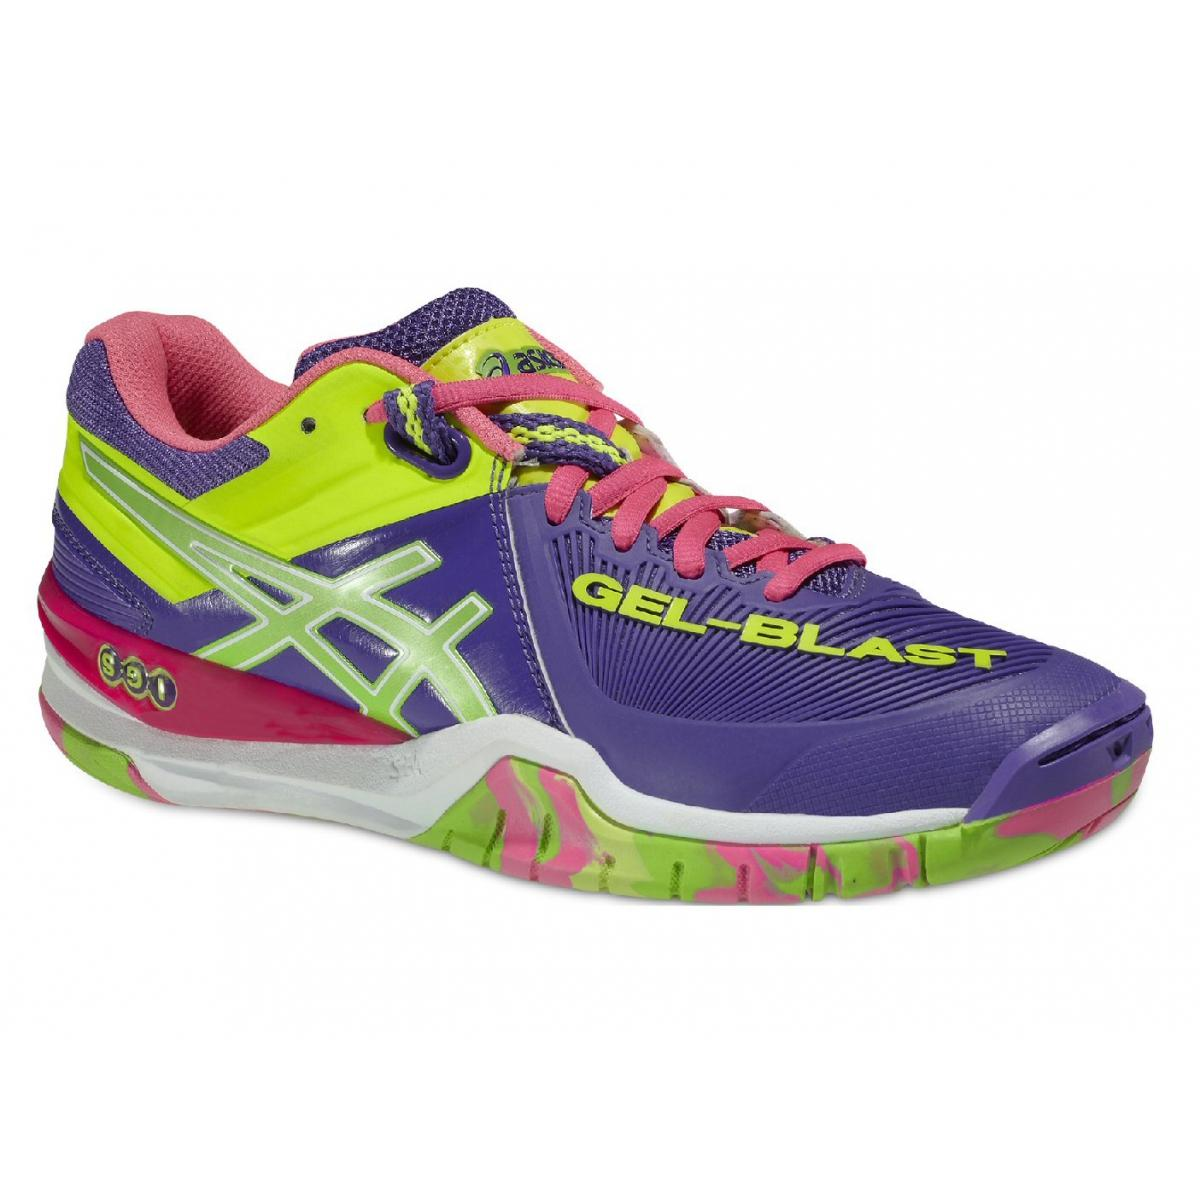 Asics Gel Blast 6 multi colour women's handball indoor court shoe trainers  E463Y